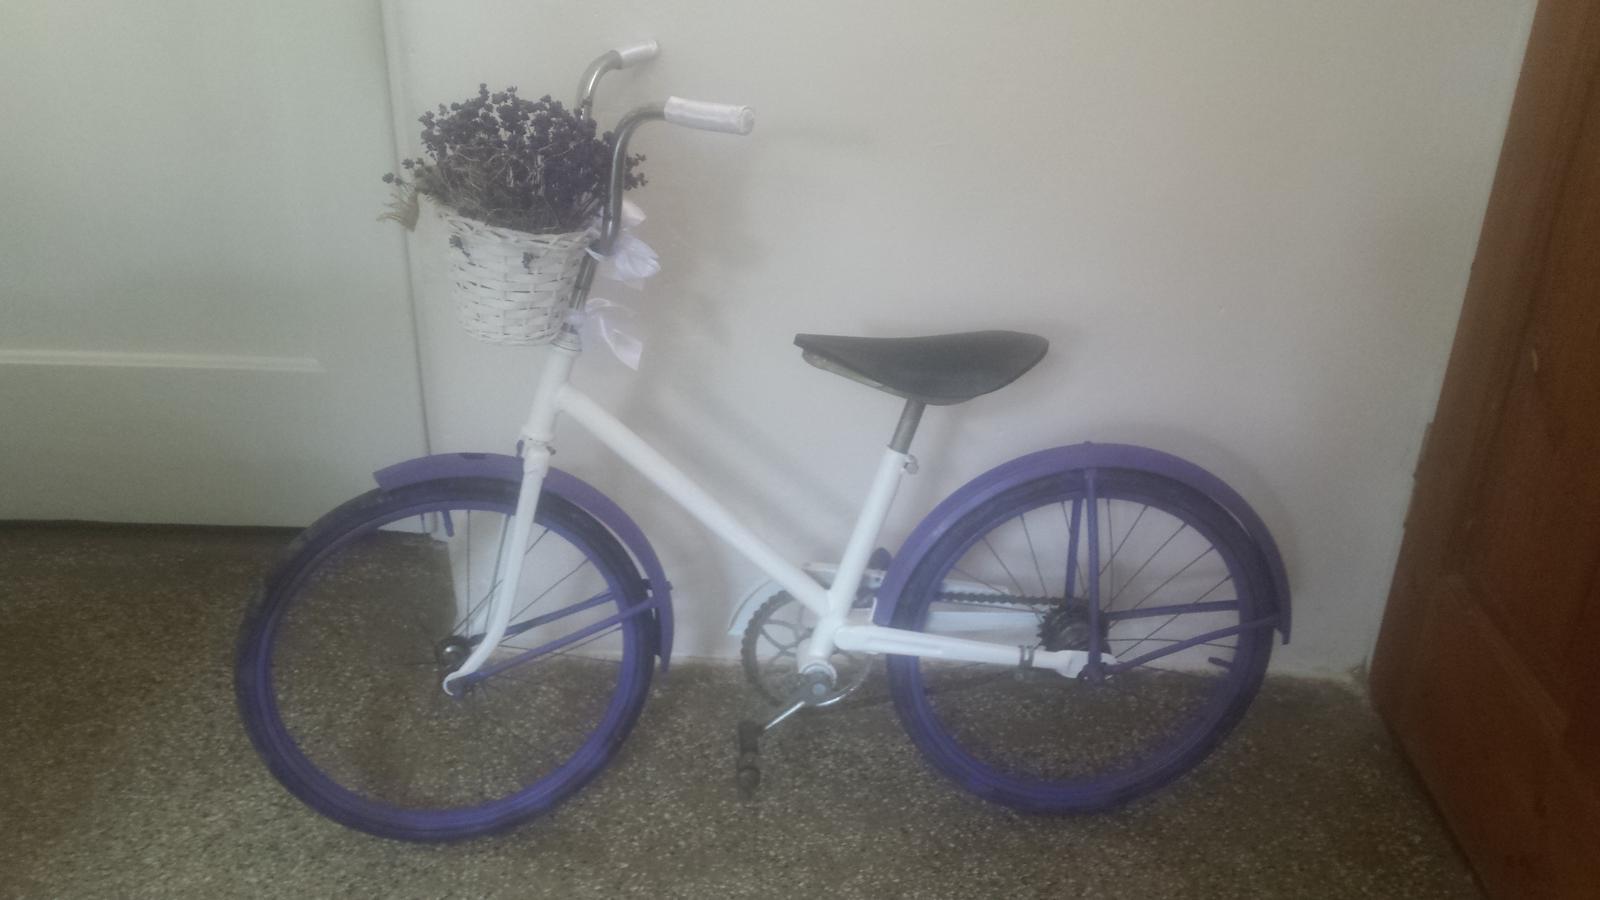 Pomaly zbierame ☺ - Vysoko romantikuš bicykel je hotový. ☺